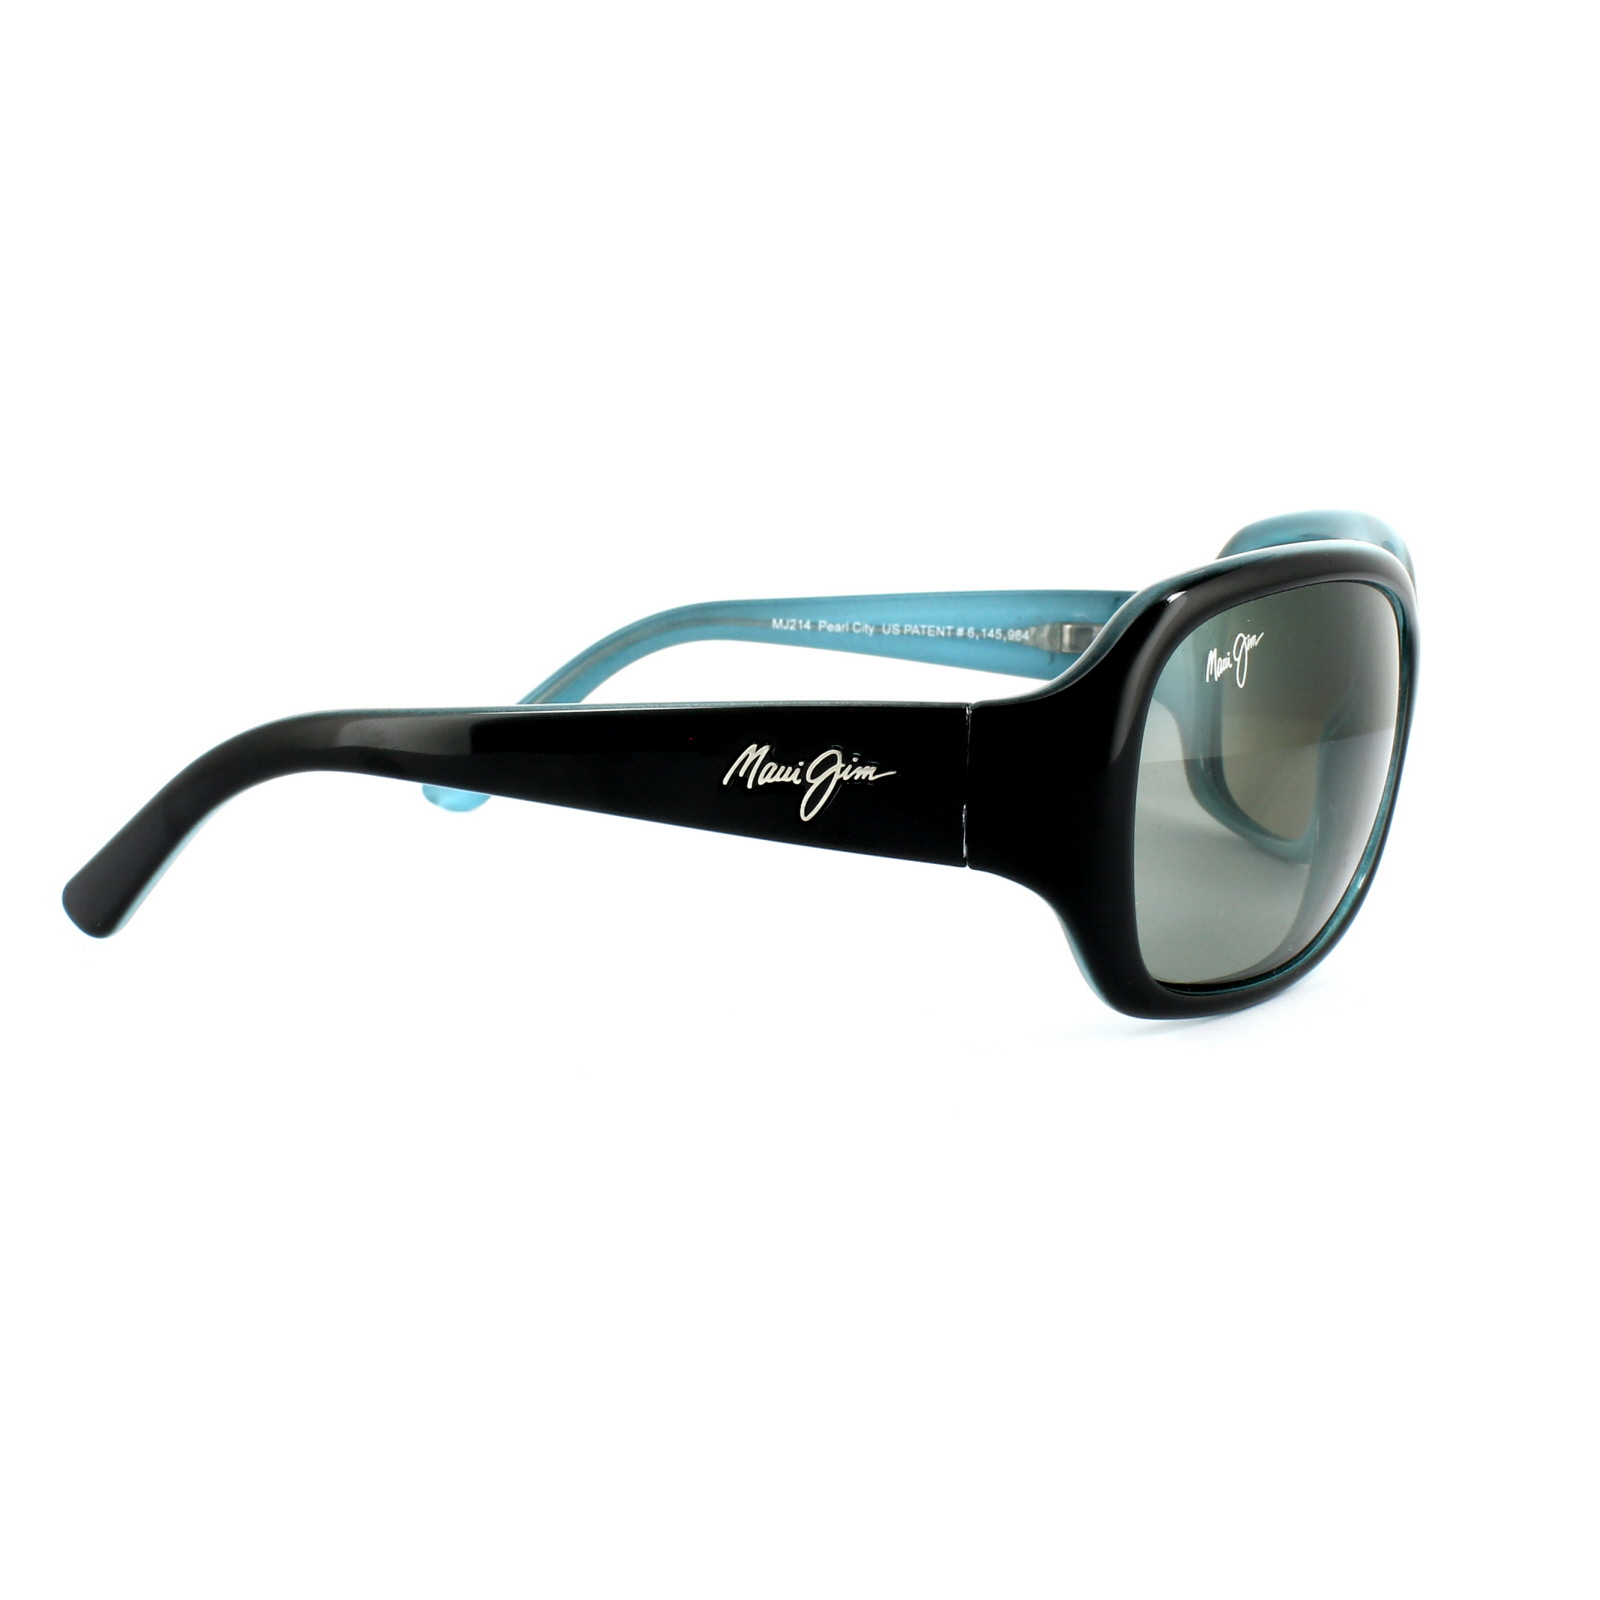 Cheap Maui Jim Pearl City Sunglasses Discounted Sunglasses